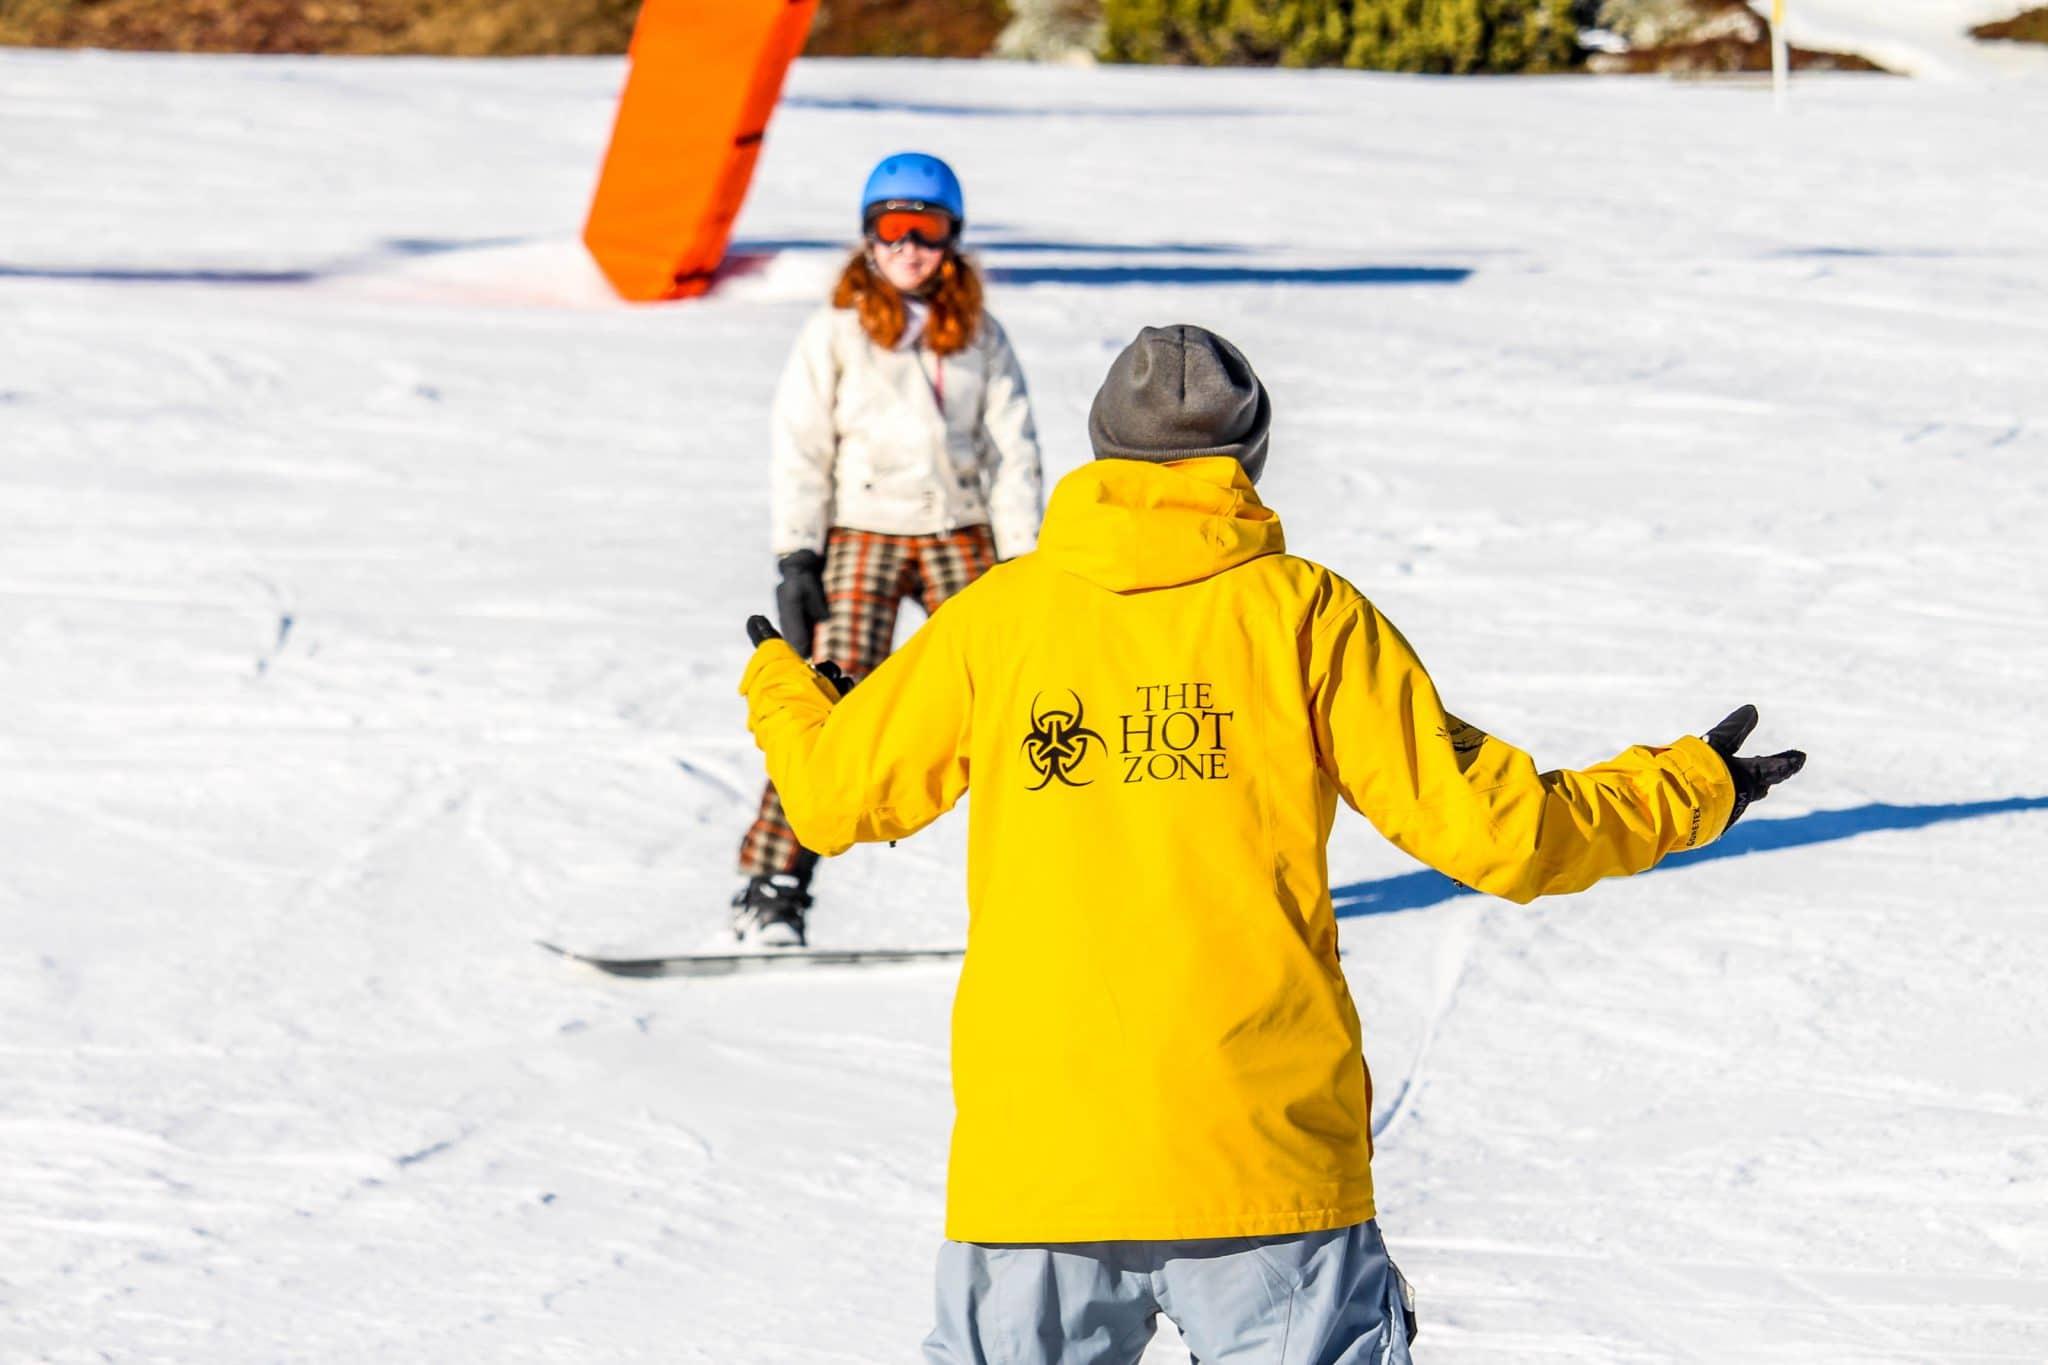 Snowboardleraar The Hotzone